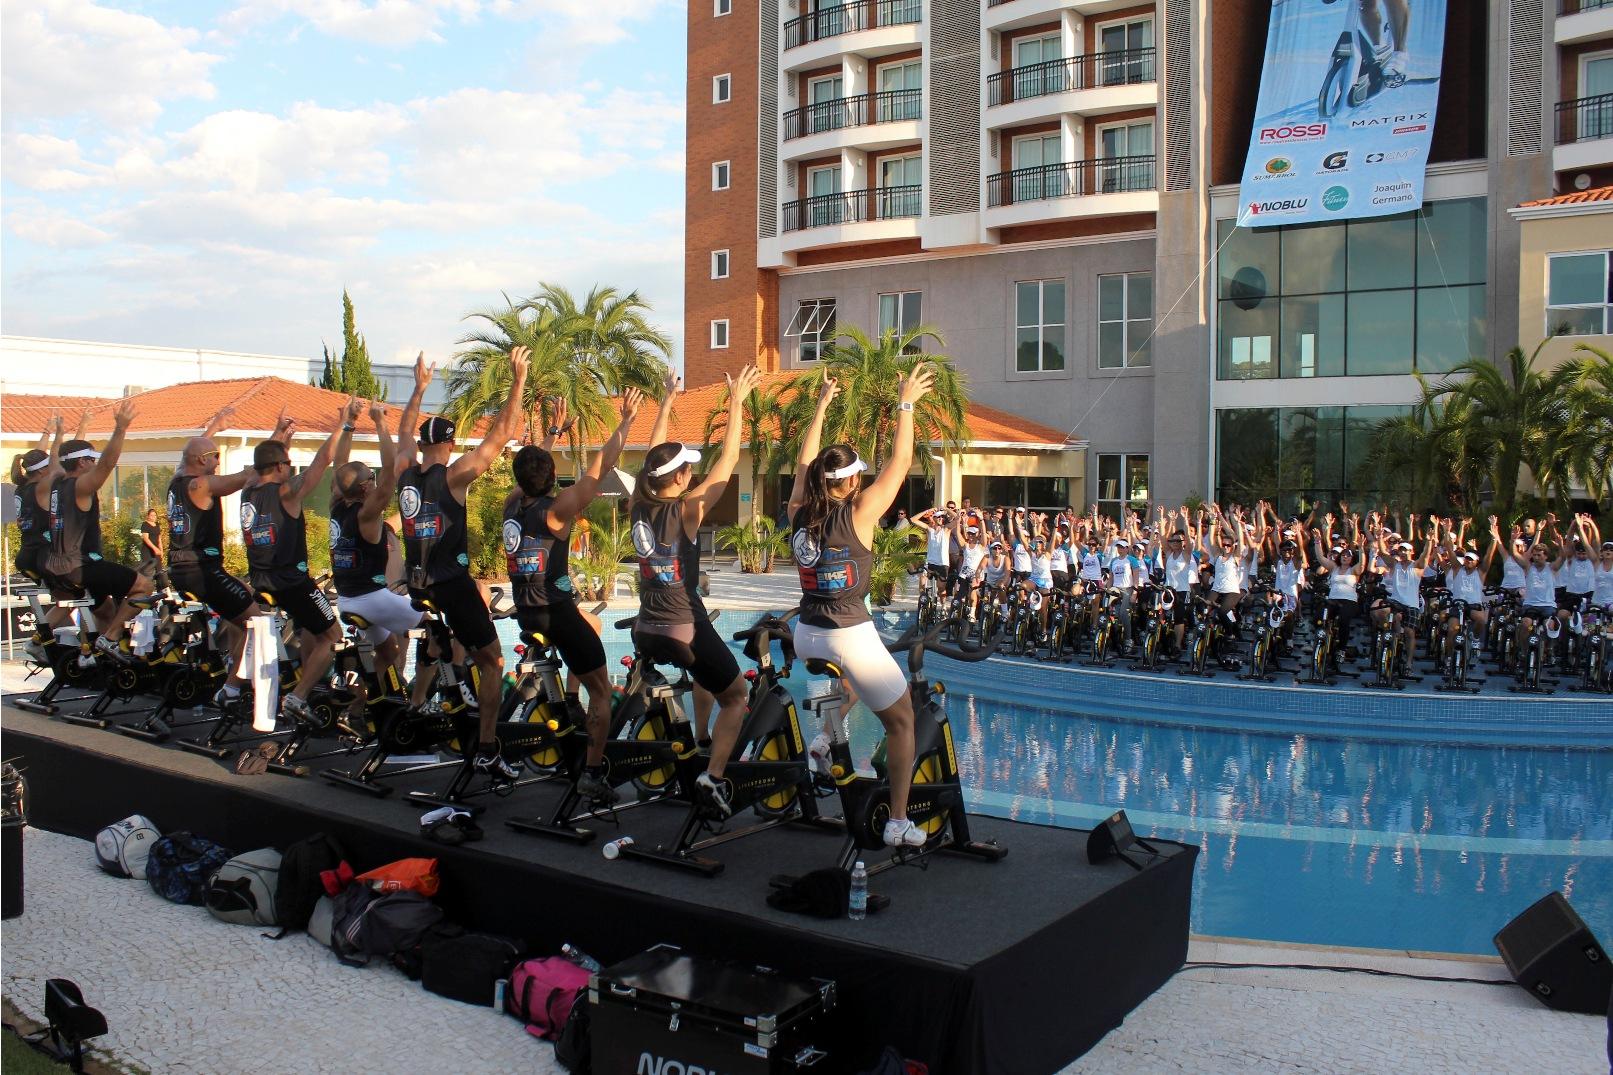 5 Hours Bike Day Indaiatuba 2012 (1)